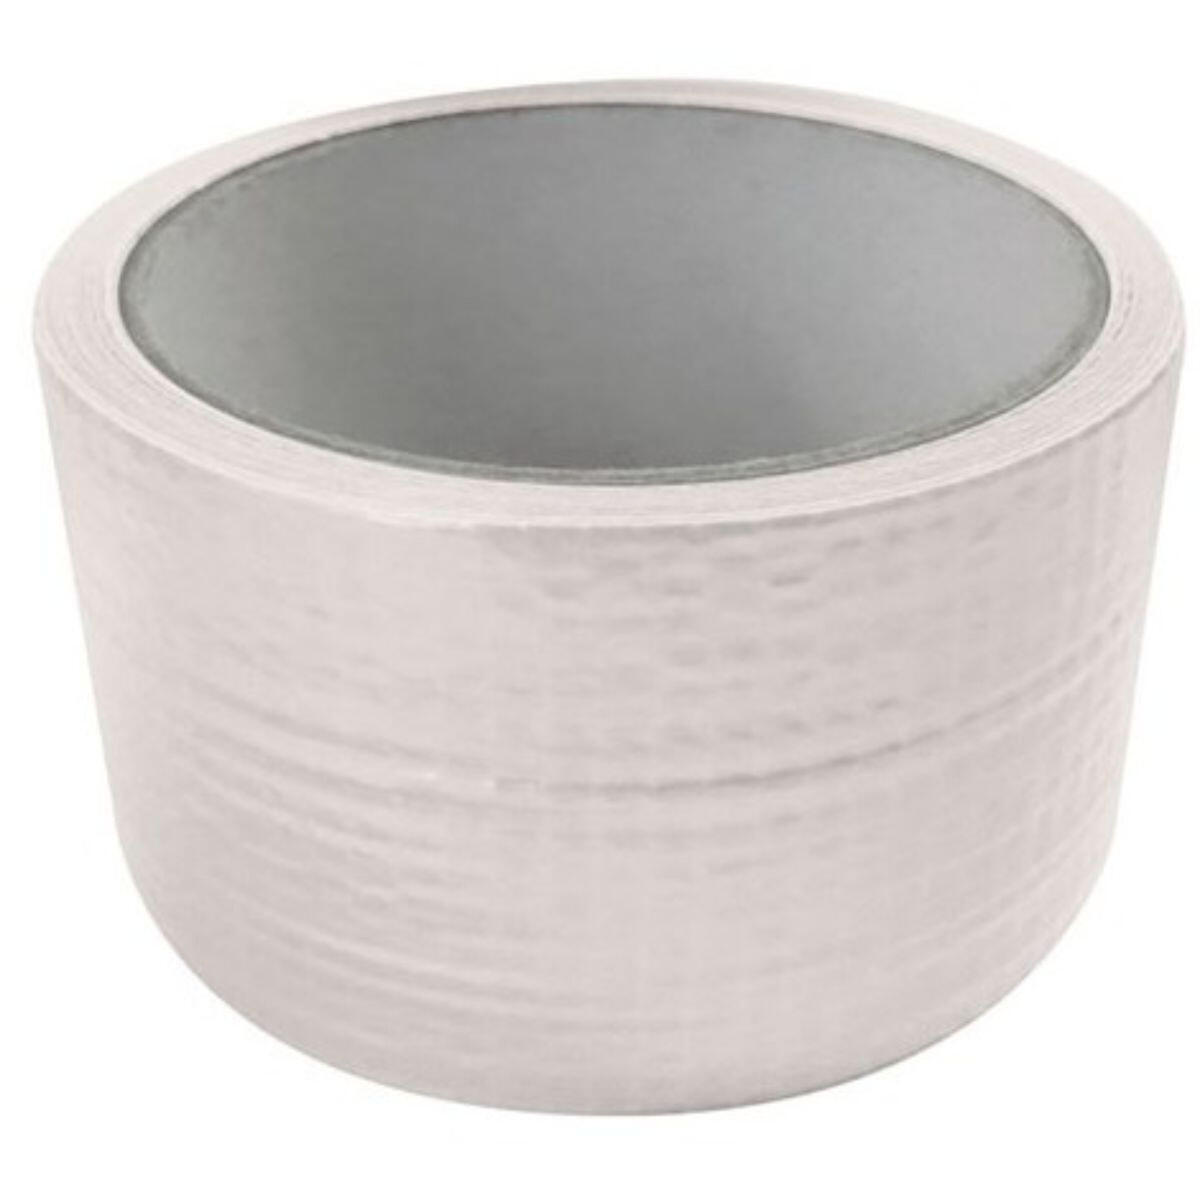 Nastro adesivo GEKO USA 50 mm x 10 m bianco